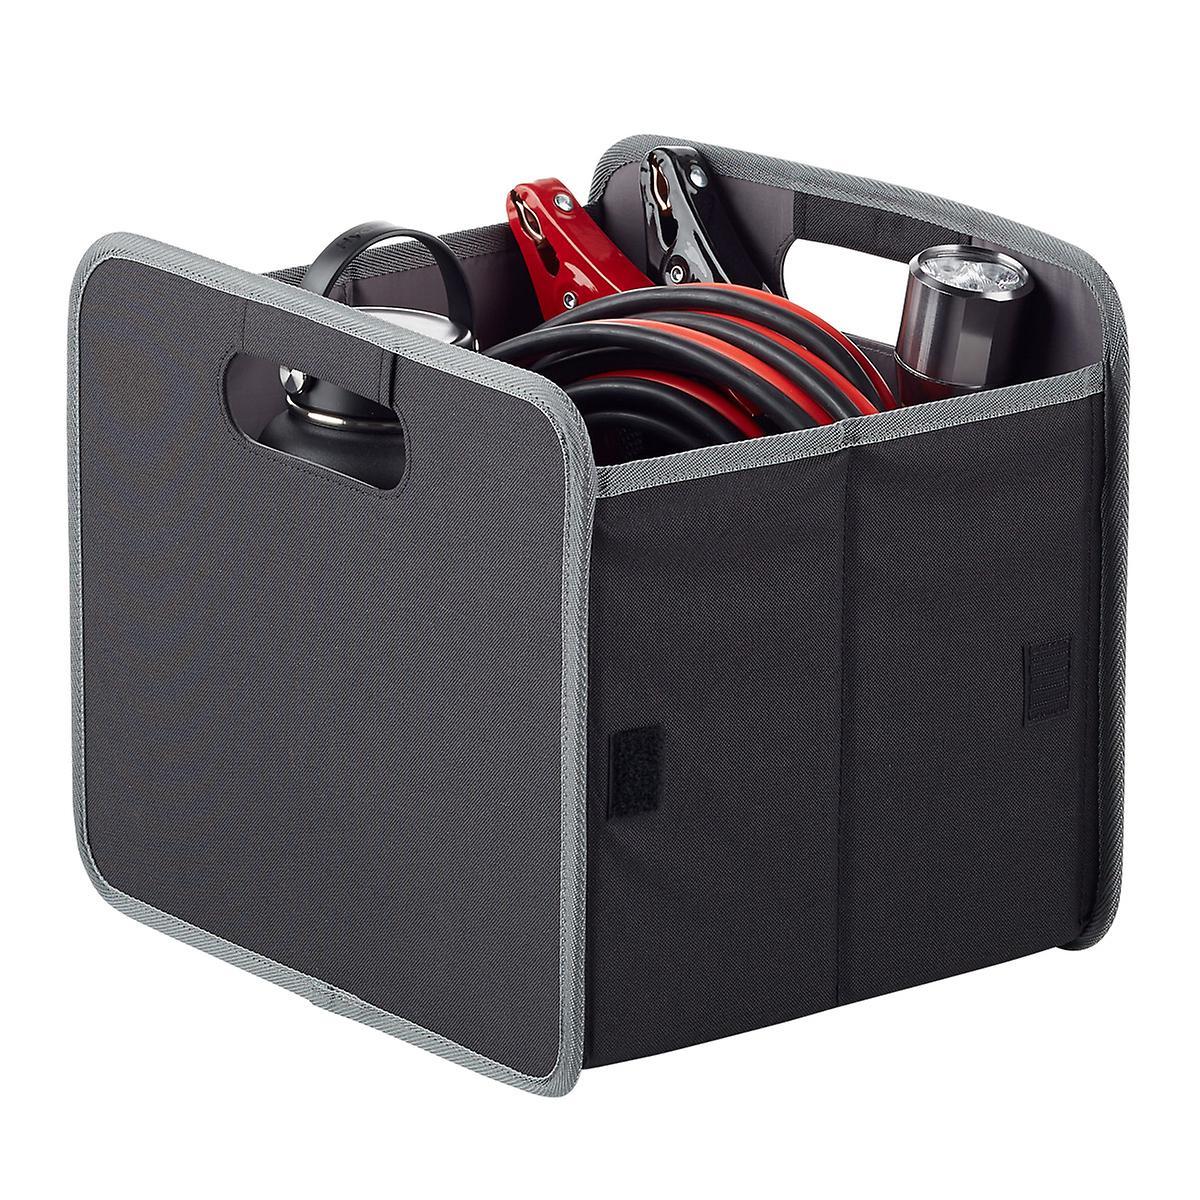 Small Foldable Trunk Organizer